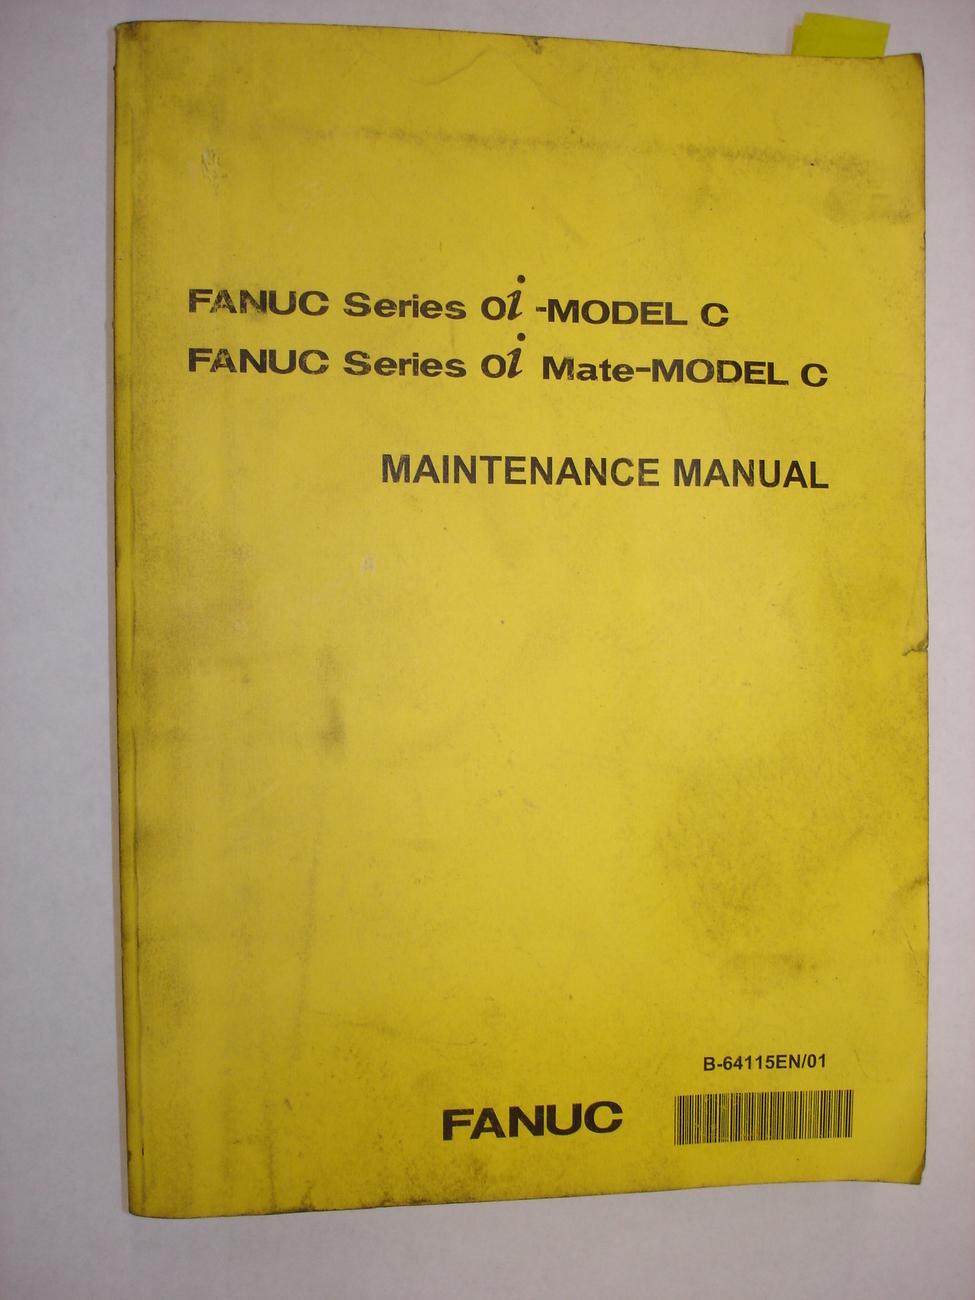 Fanuc Series 0i-Model C Maintenance Manual